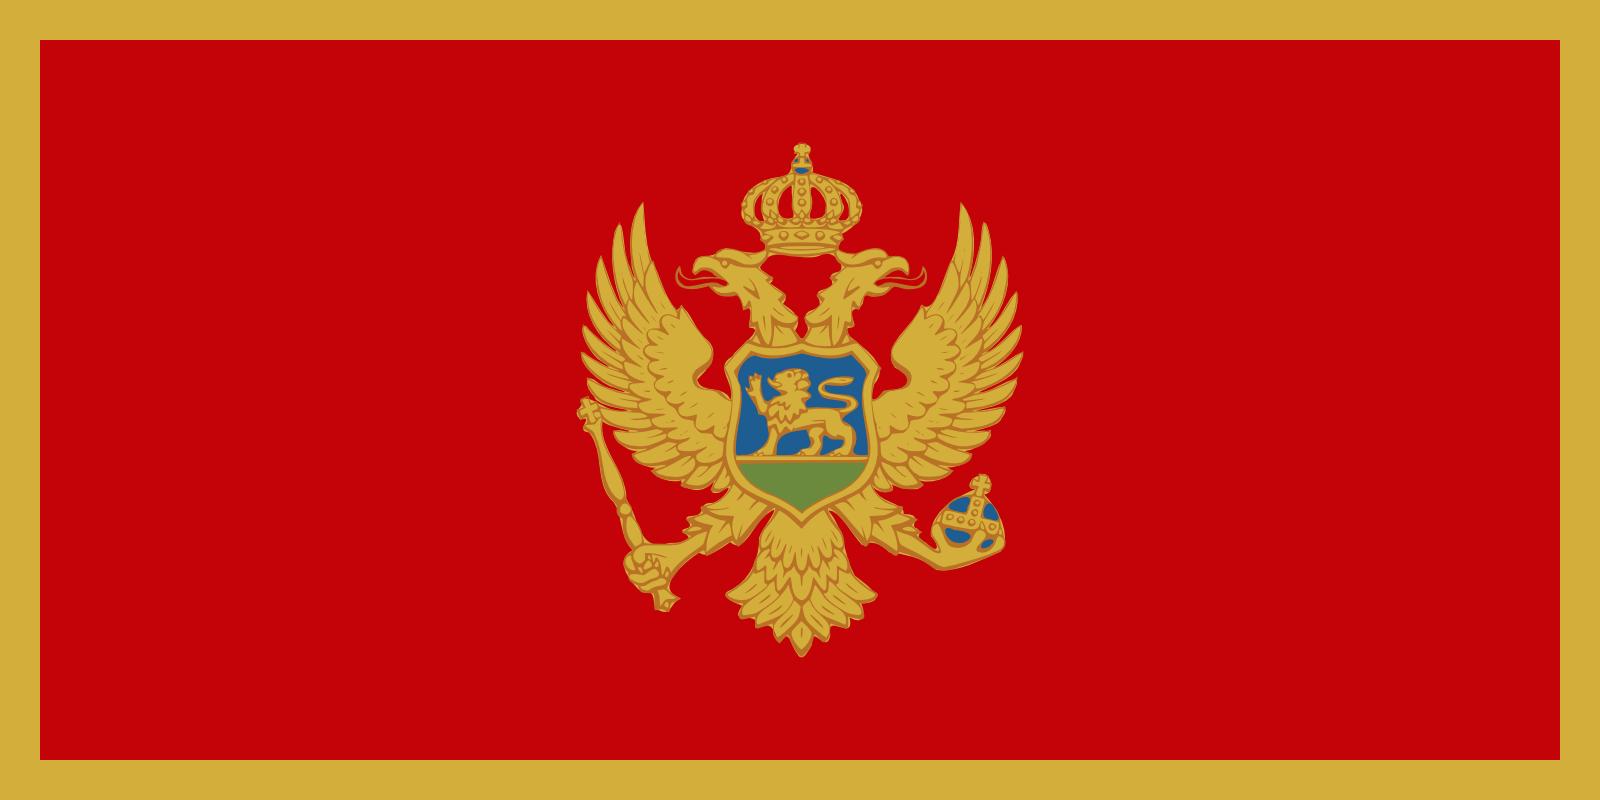 High Resolution Wallpaper | Flag Of Montenegro 1600x800 px